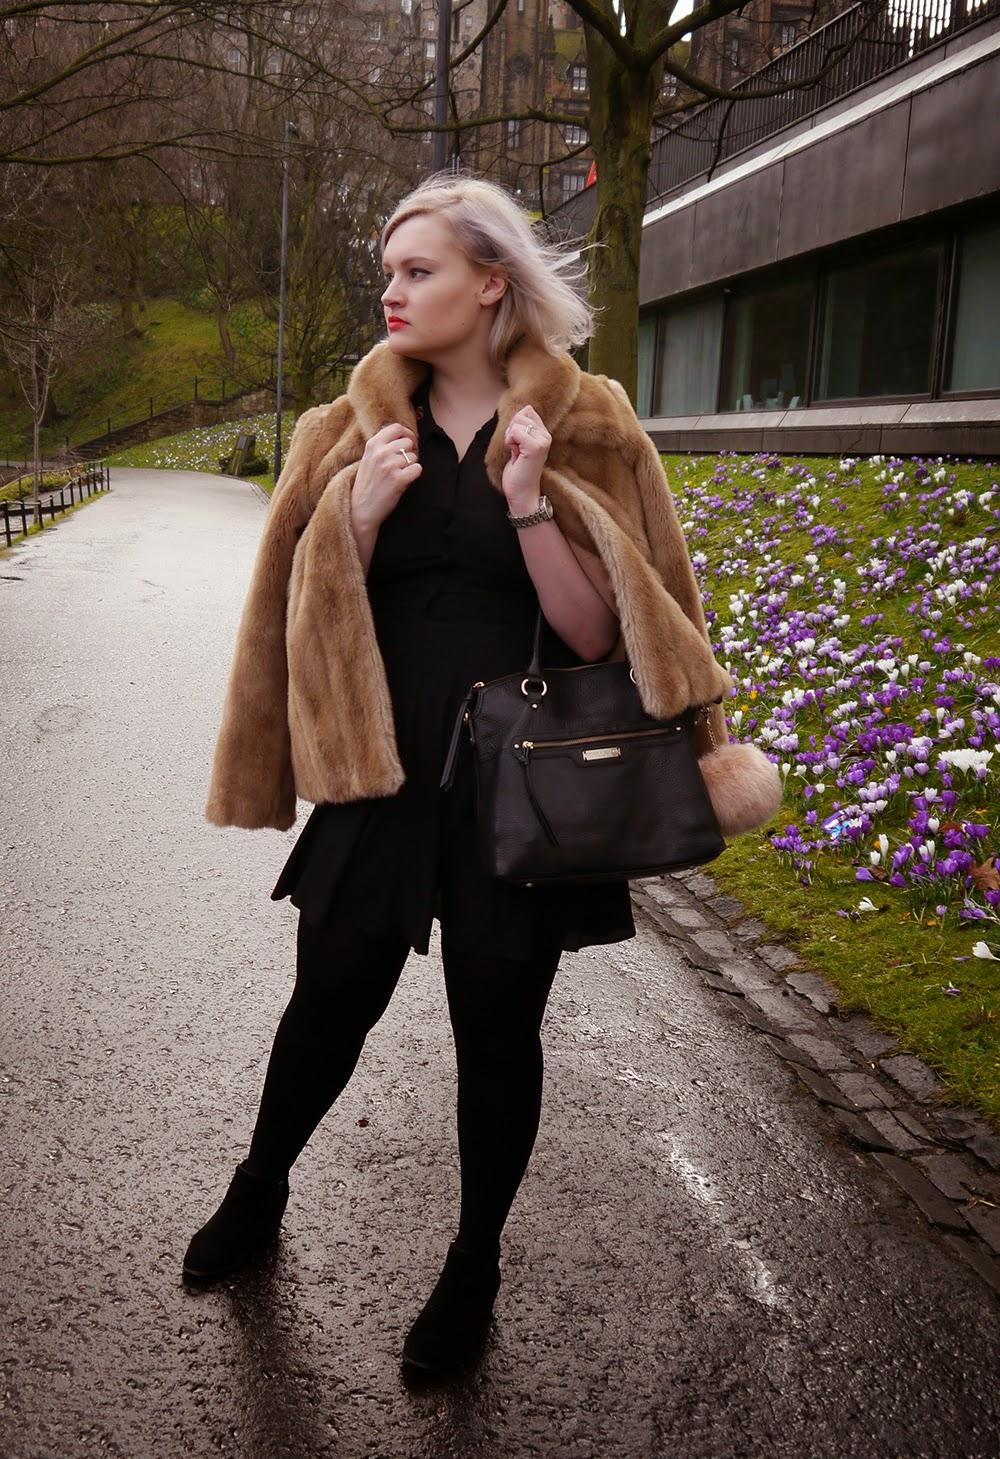 day one, Edinburgh Fashion Week, 2015, Satisfashion, model, catwalk, outfit, fashion, style, the mound, This Is Edinburgh, #EdFashionWeek, Scottish blogger, street style